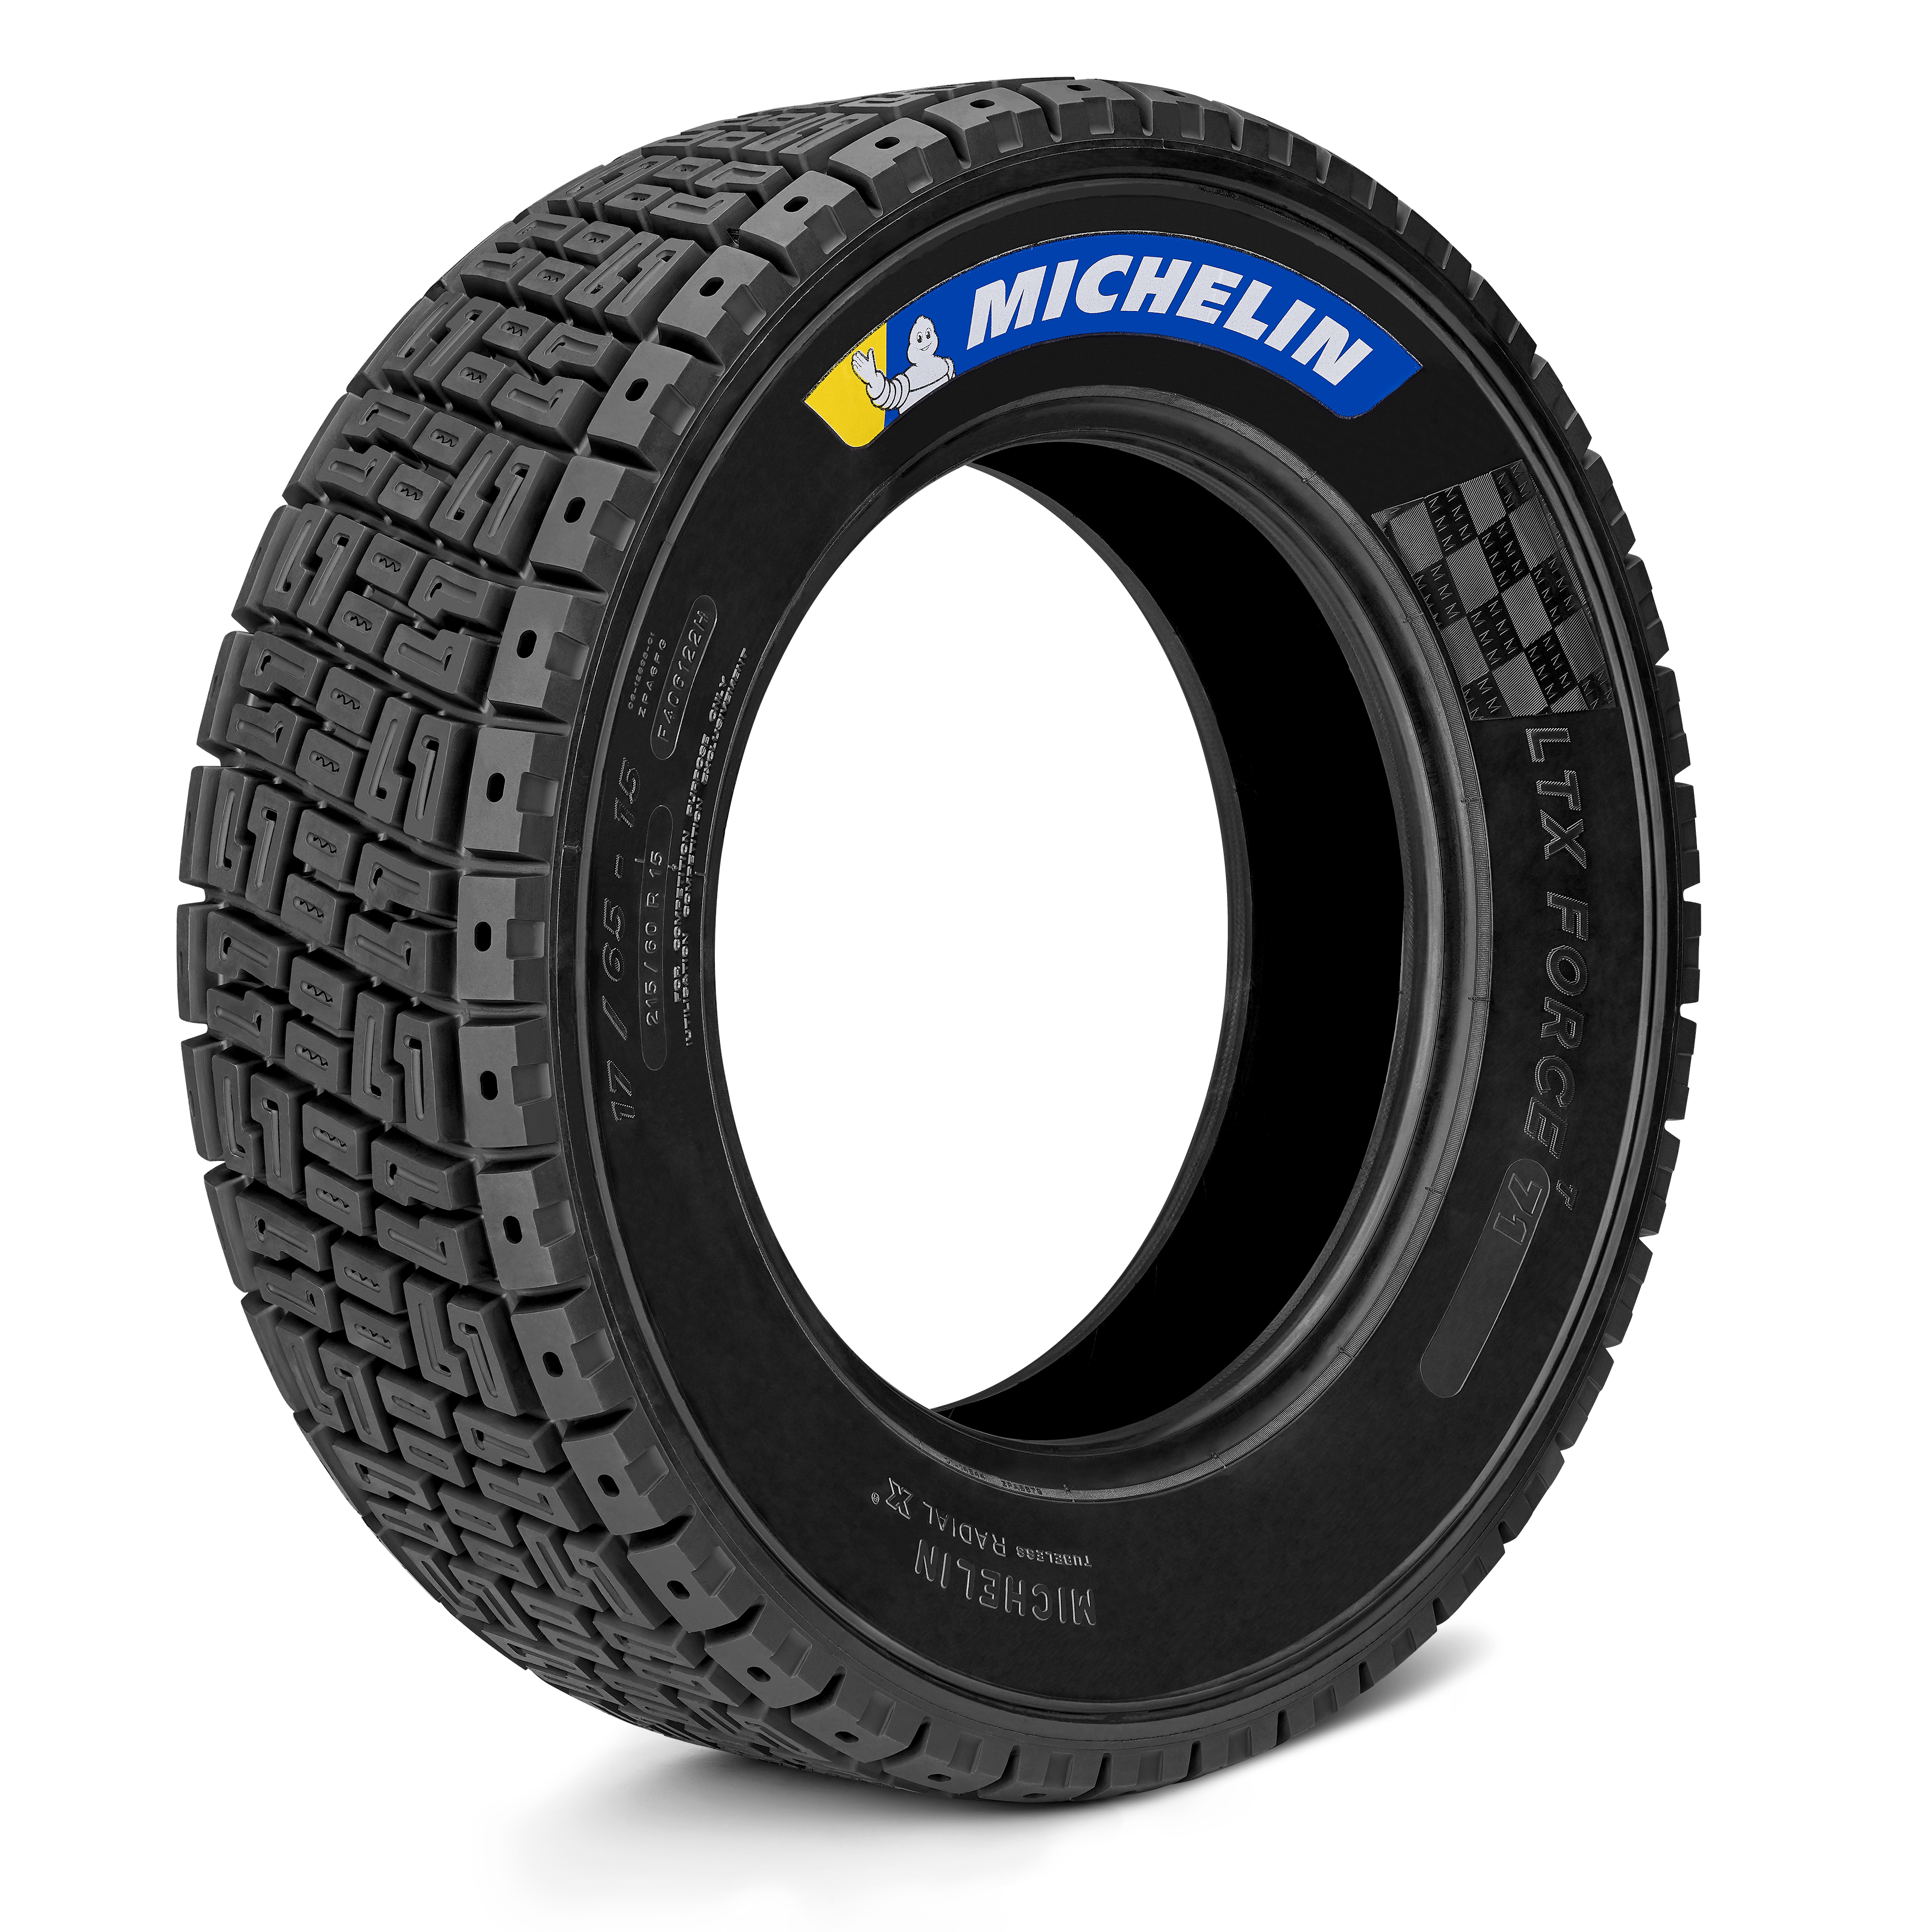 Michelin / LTX Force T